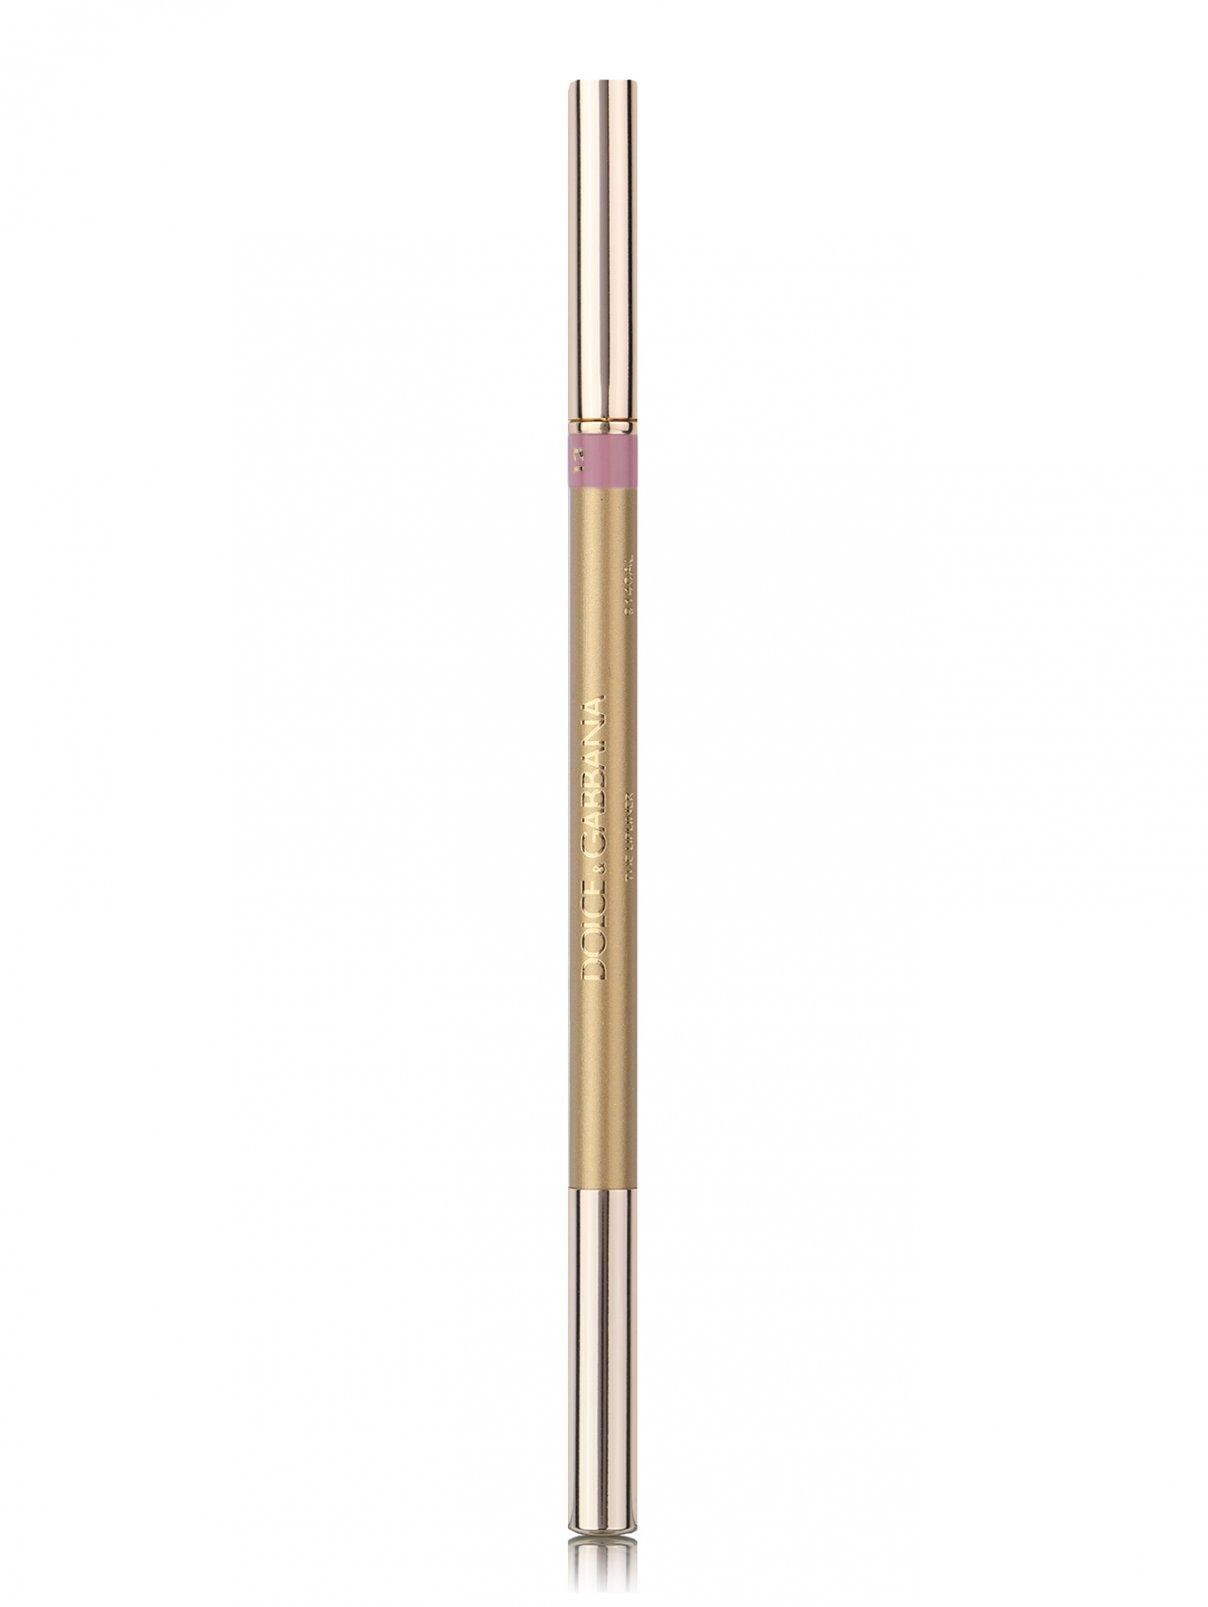 Карандаш для губ, 12 ROSE PEARL, 1,88 г Dolce & Gabbana  –  Общий вид